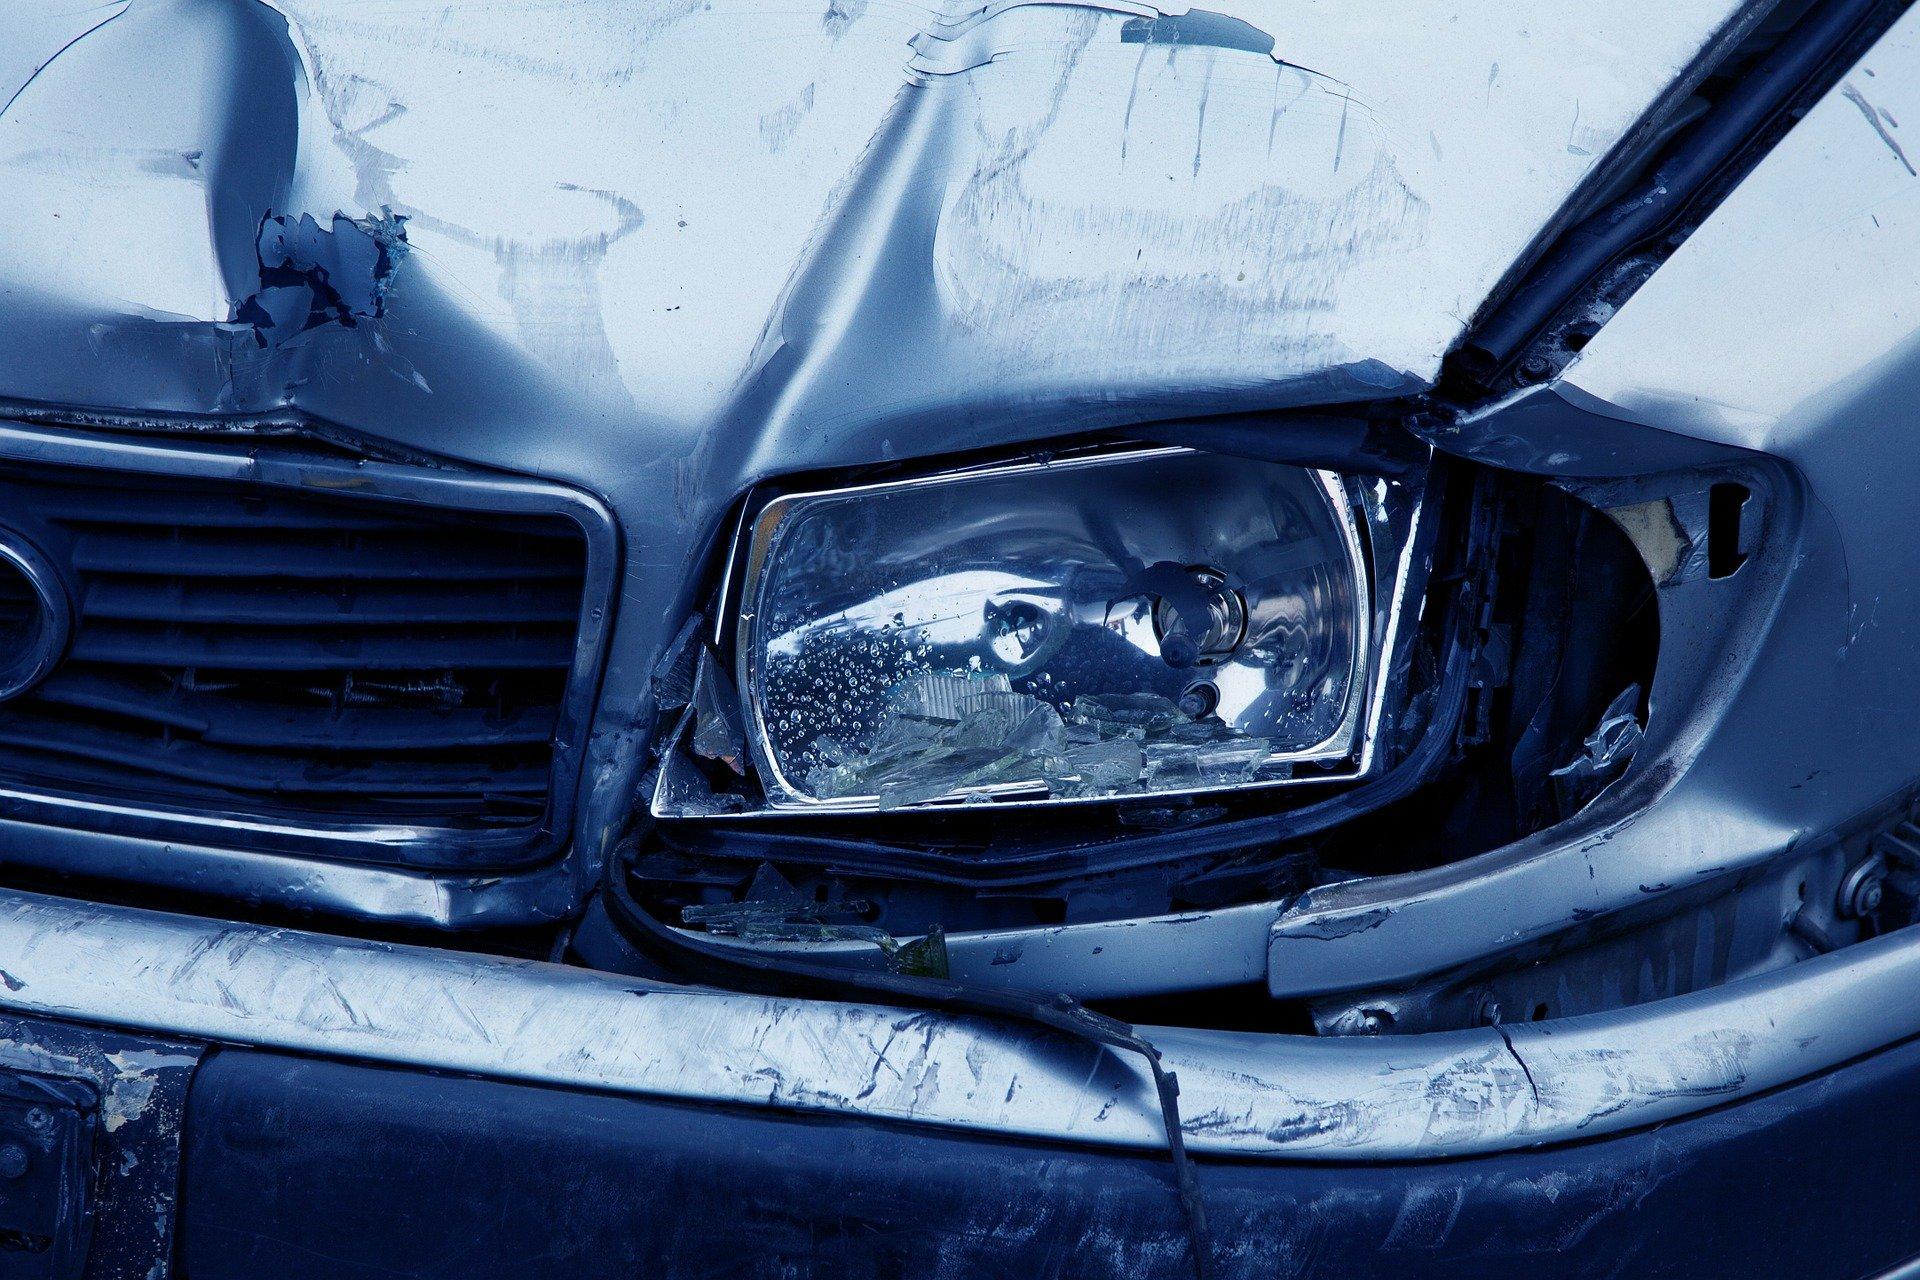 Cash for Damaged Car Disposals in Toronto